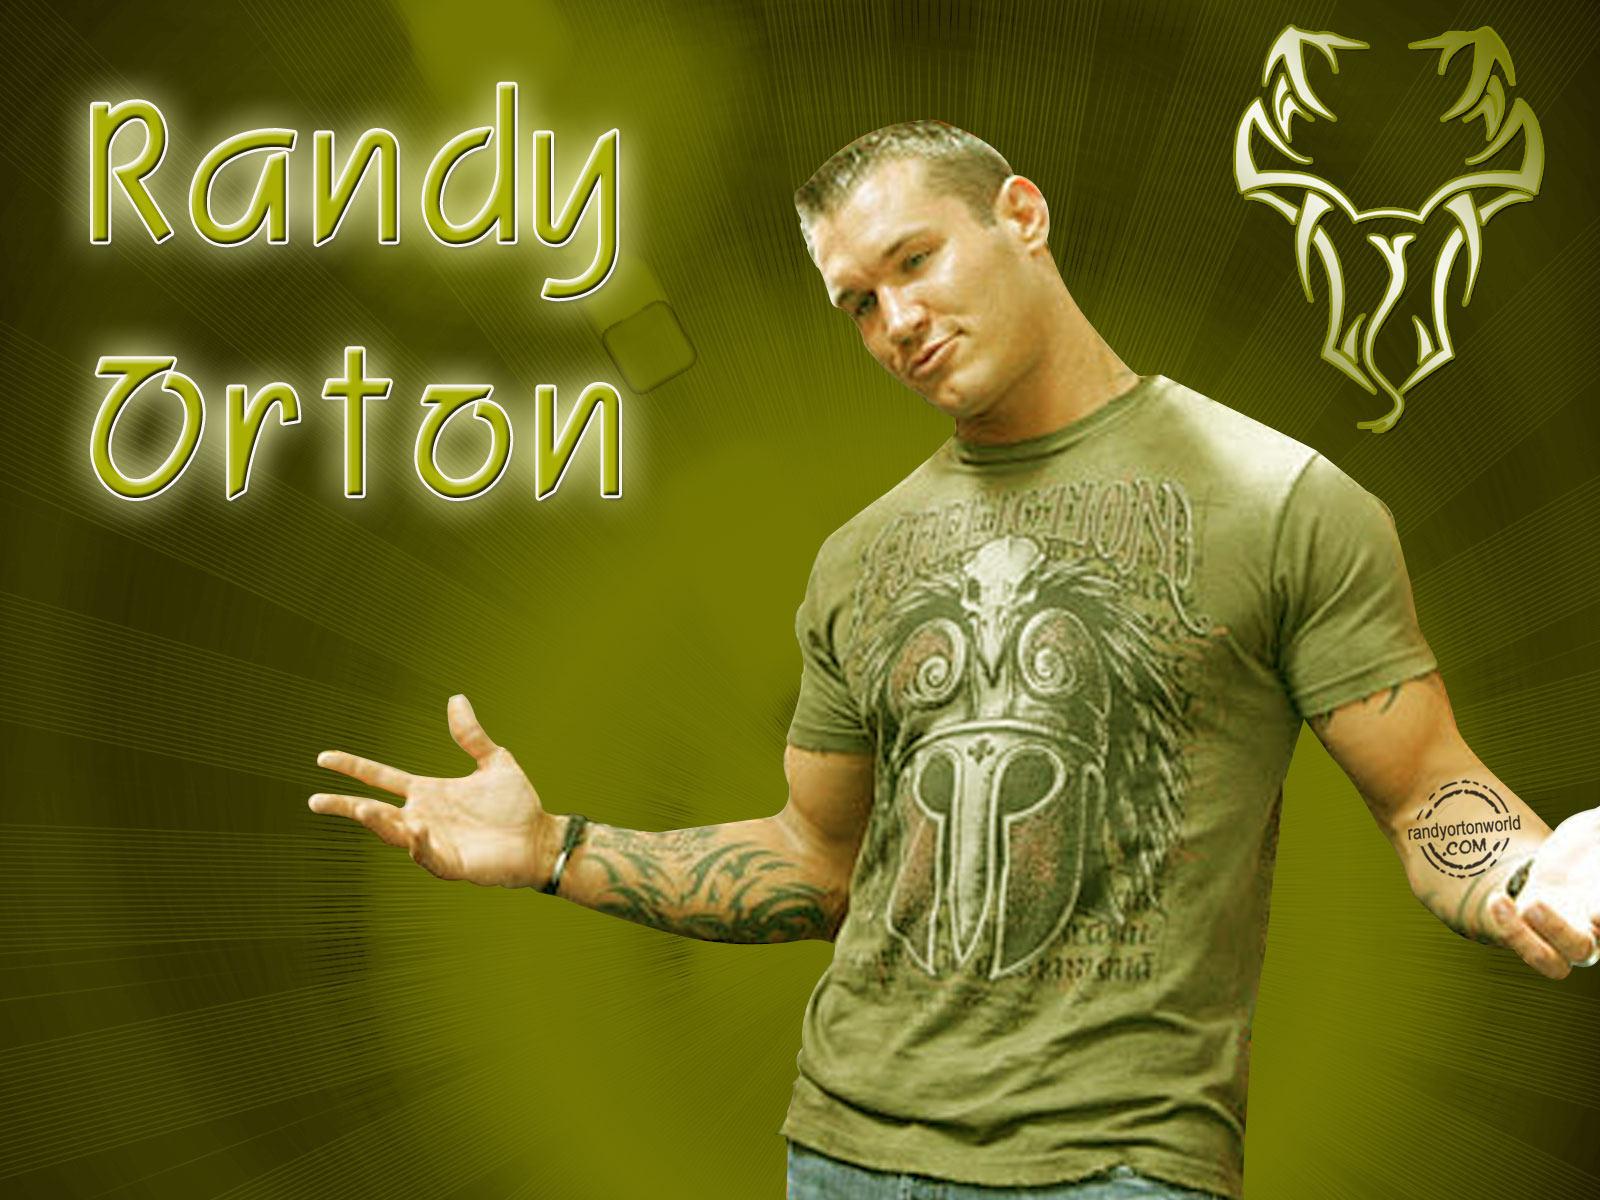 http://3.bp.blogspot.com/-Qm0nrrEOQ2A/UHadgEnCXDI/AAAAAAAAH18/qoxzcuolkmM/s1600/Randy-Orton-Wallpaper-15.jpg